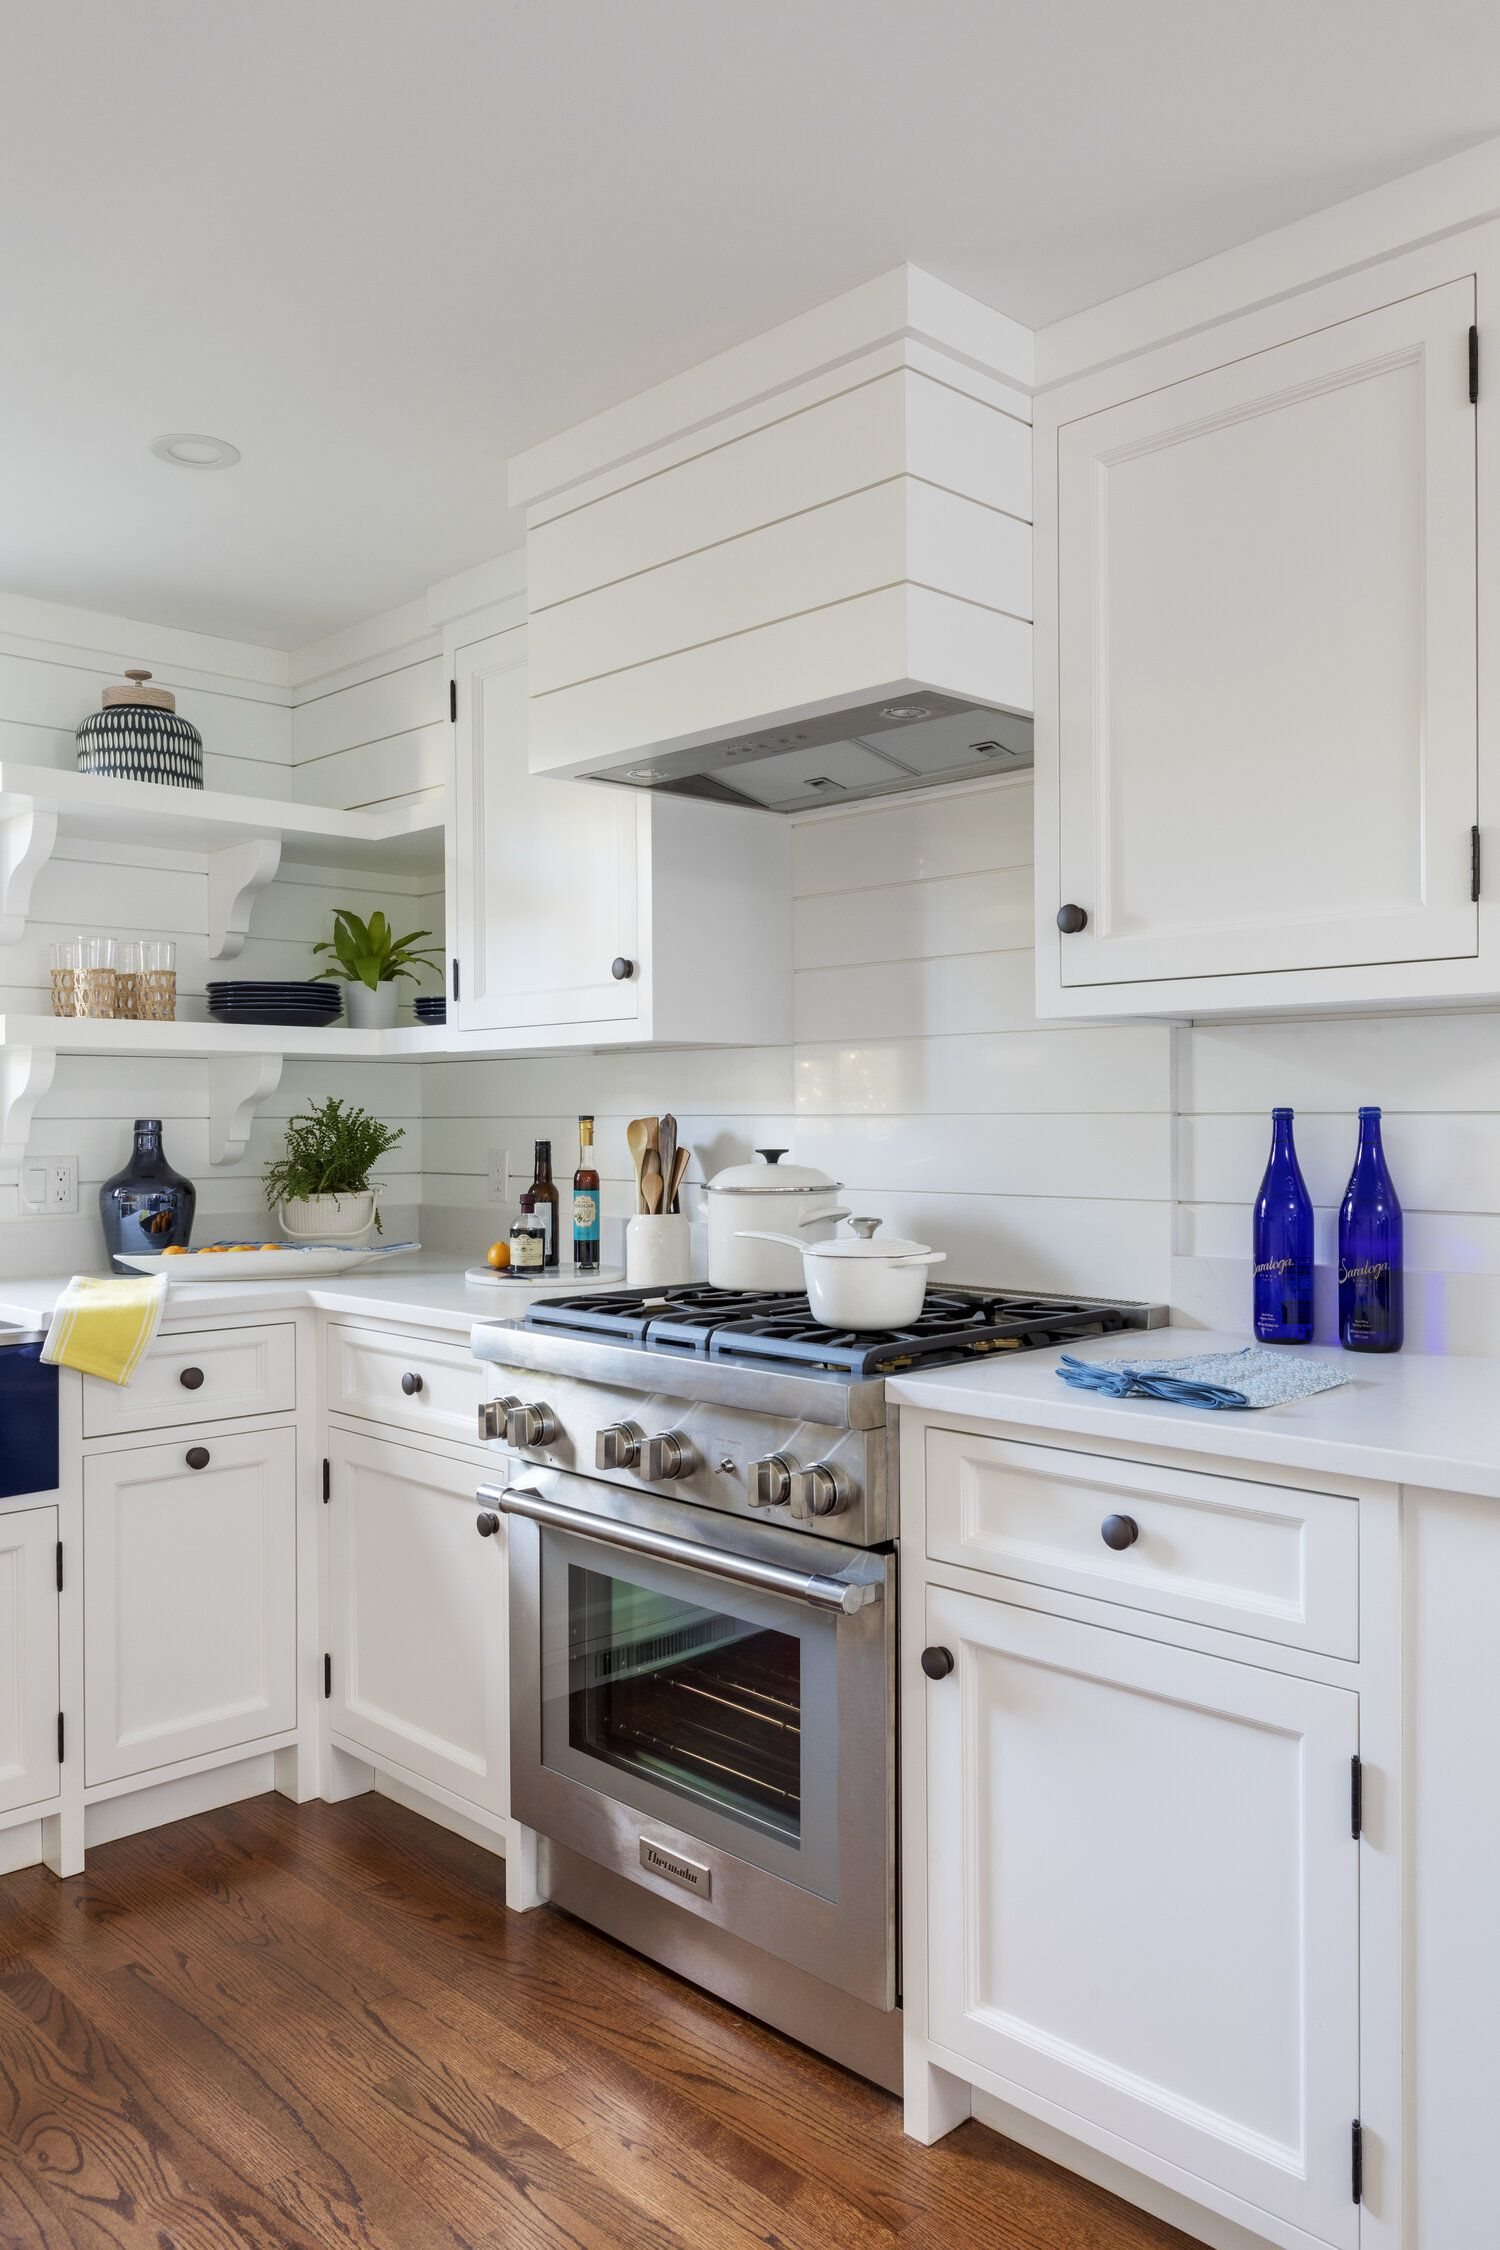 Small Blue And White Kitchen Beach Cottage Lake House Beach House Interiordesign Homedecor Kitchen Decor Inspiration Kitchen Design Design Company